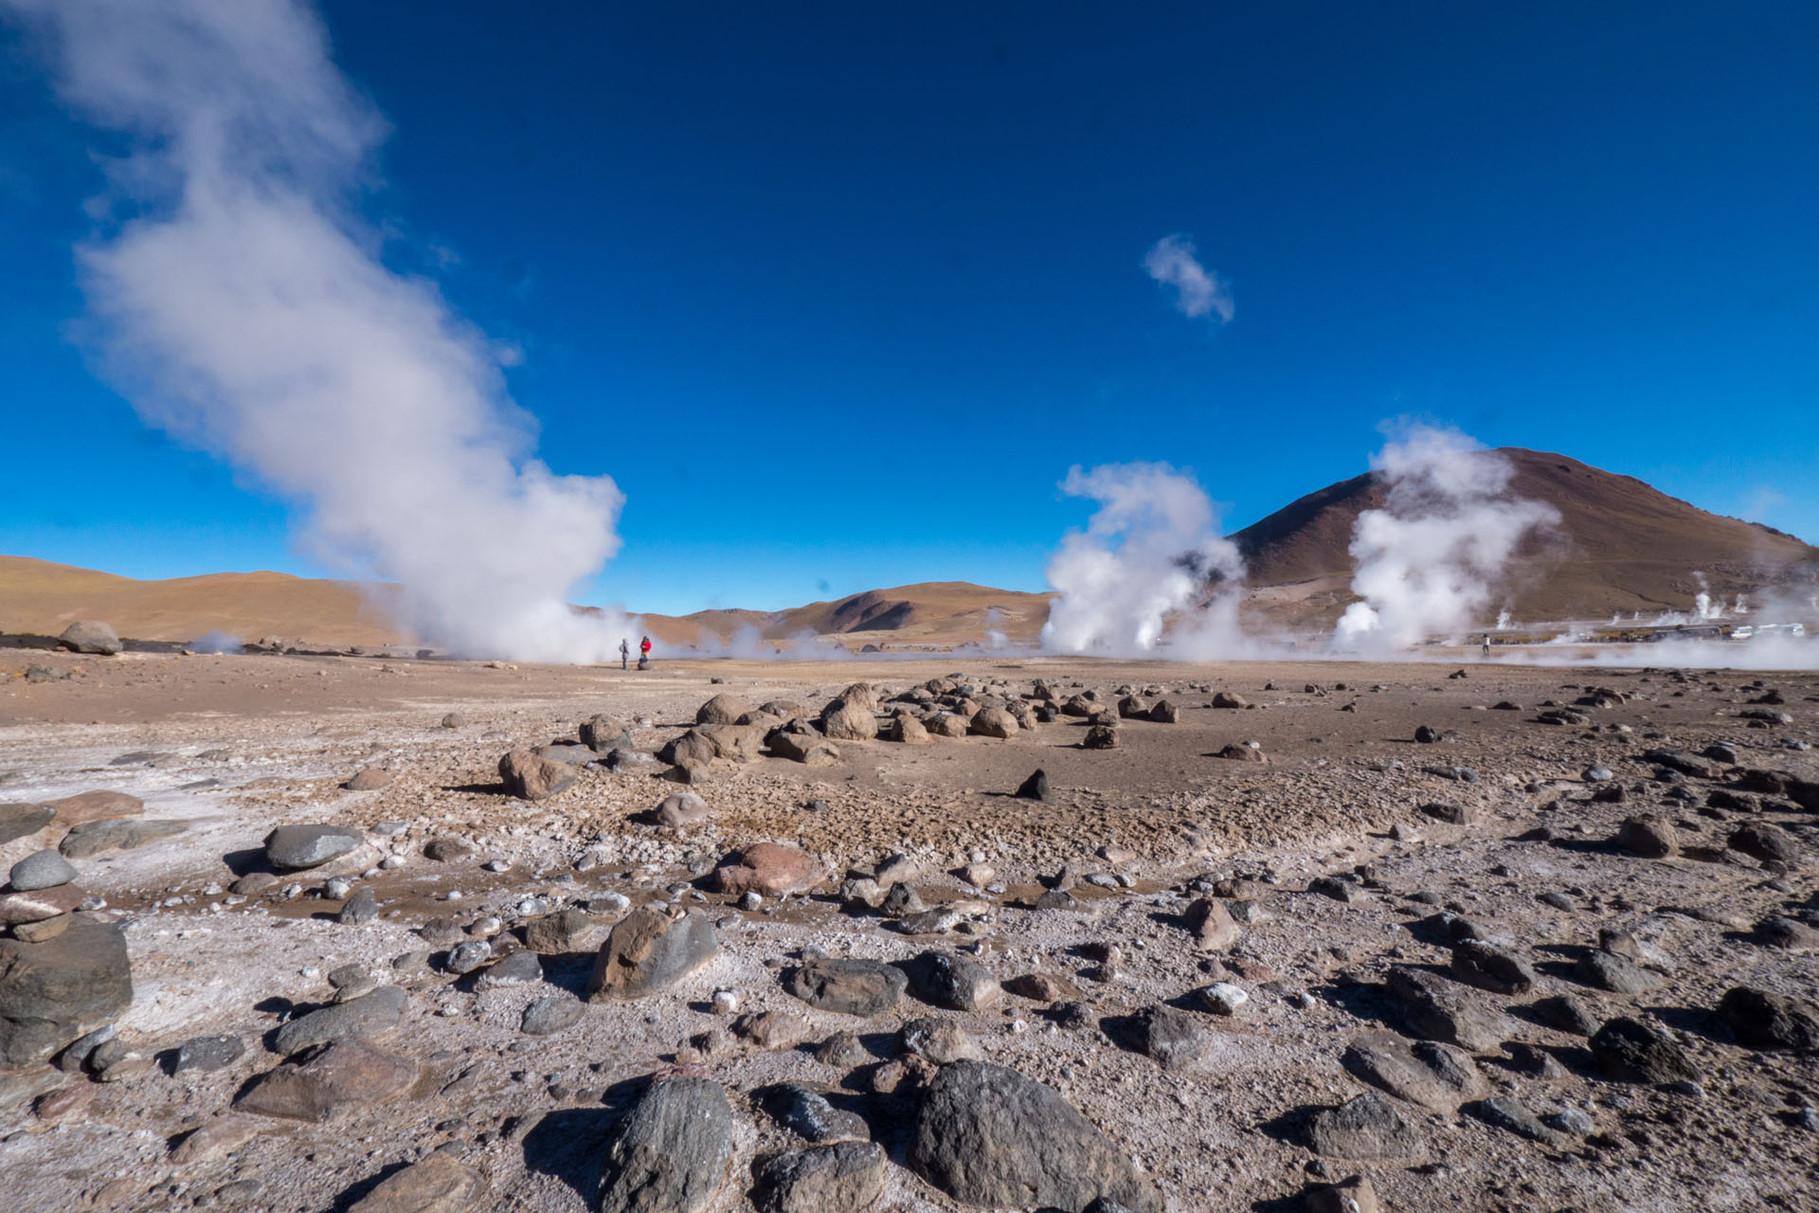 Geyser del Tatio (4.320 masl), near San Pedro de Atacama, Chile